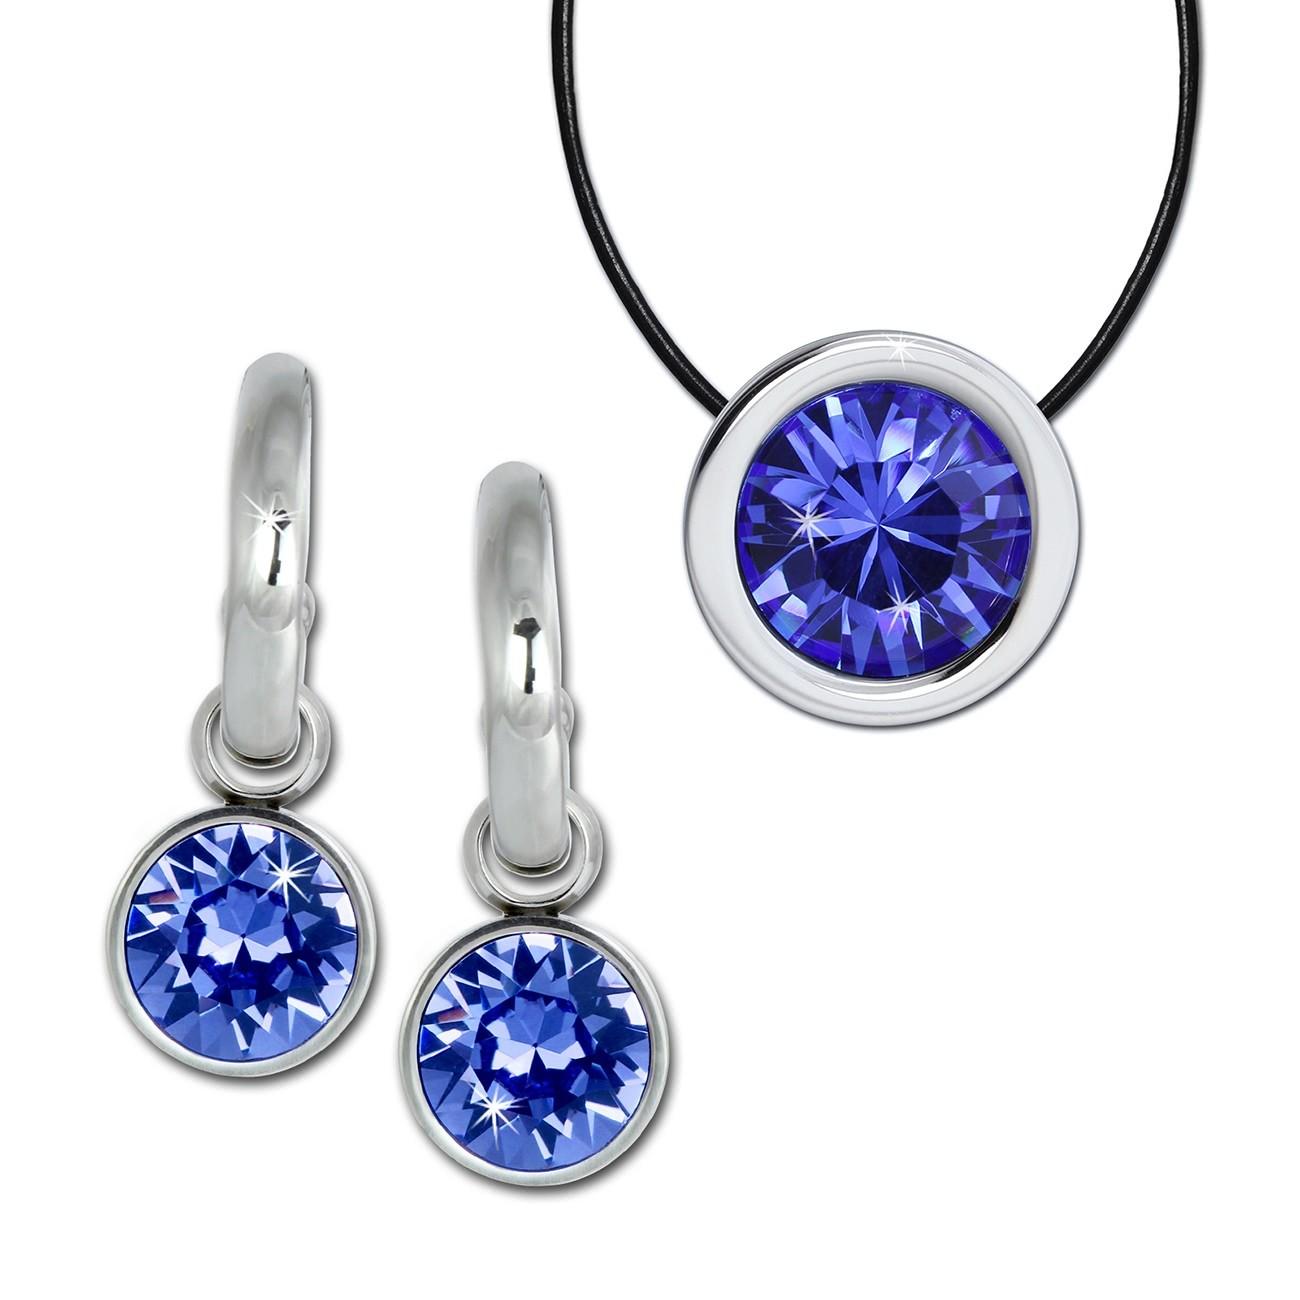 Amello Edelstahl Schmuckset Ohrring & Kette Swarovski Elements blau ESSS02B